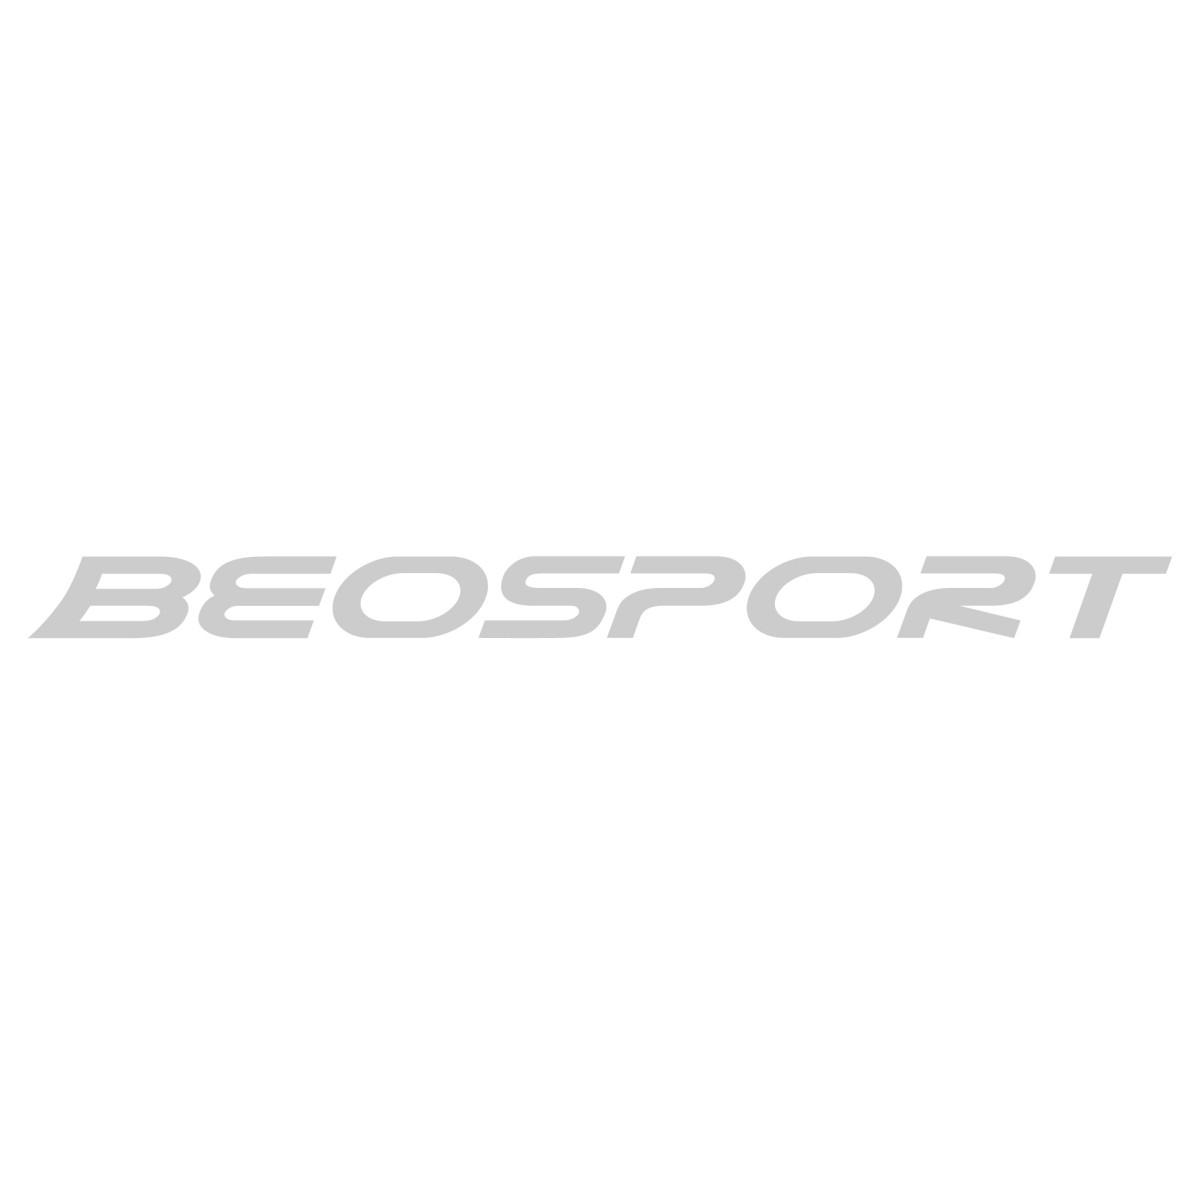 Circus Marlee cipele